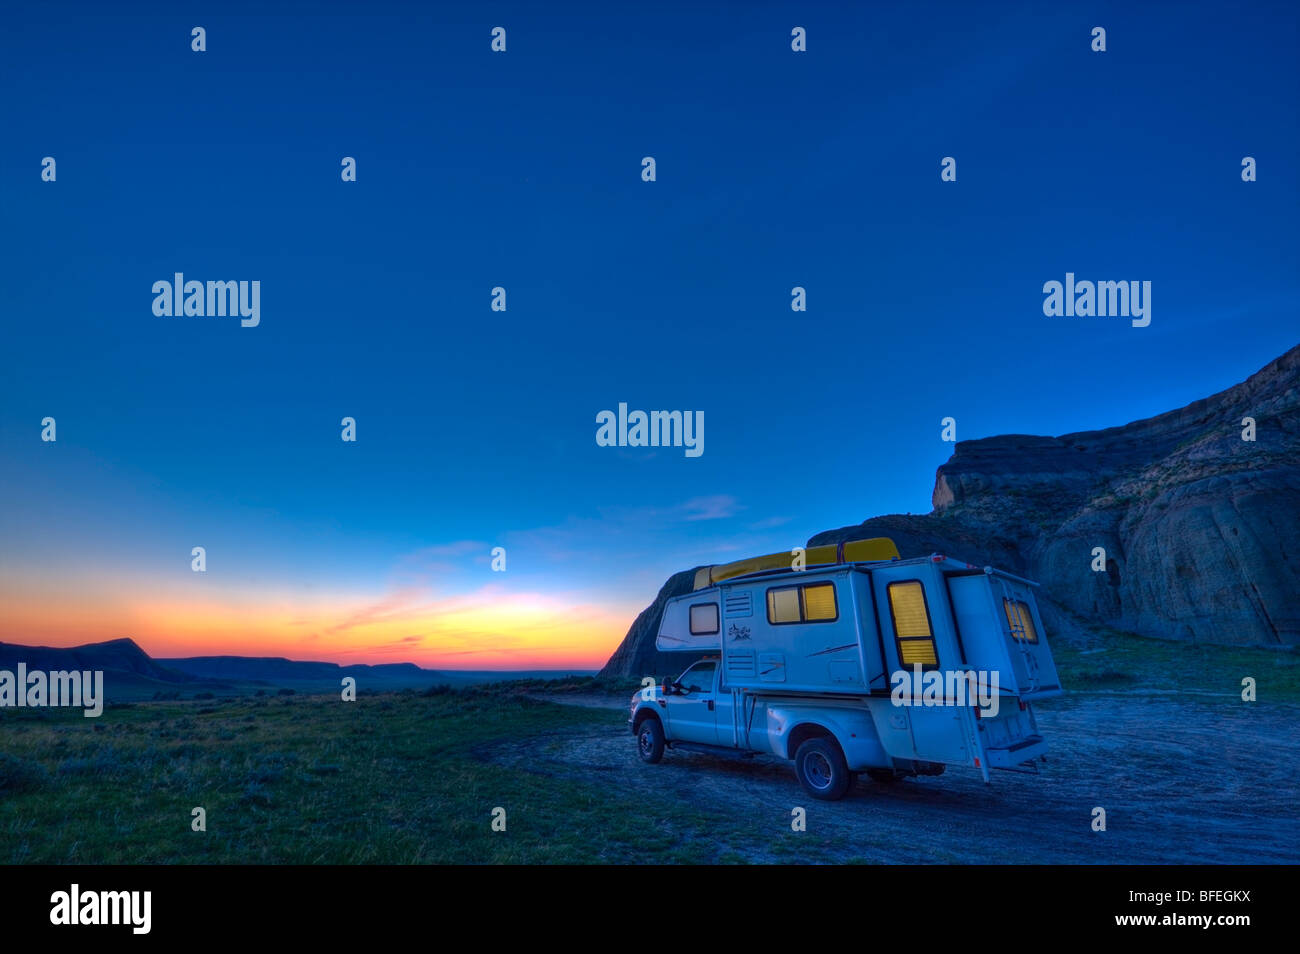 Camper at Castle Butte at dusk in the Big Muddy Badlands of southern Saskatchewan, Canada - Stock Image